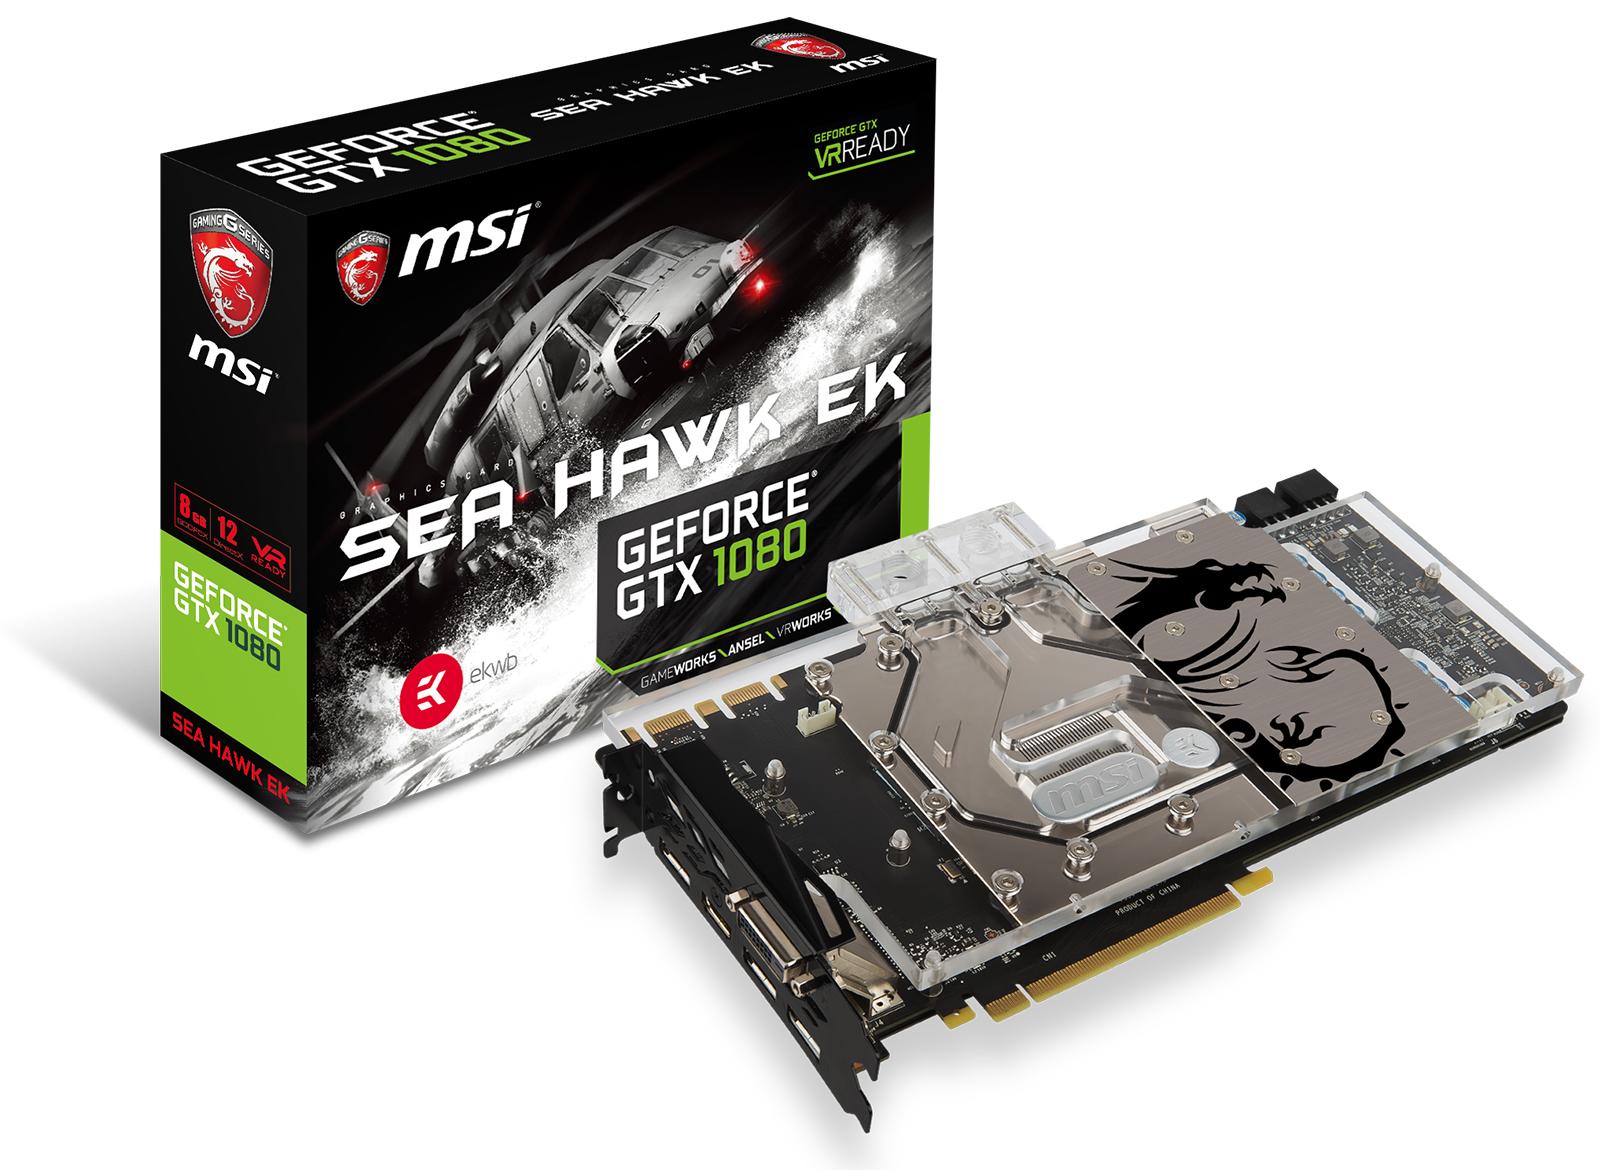 MSI® unveils their new GeForce® GTX 1080 graphics card, SEA HAWK EK